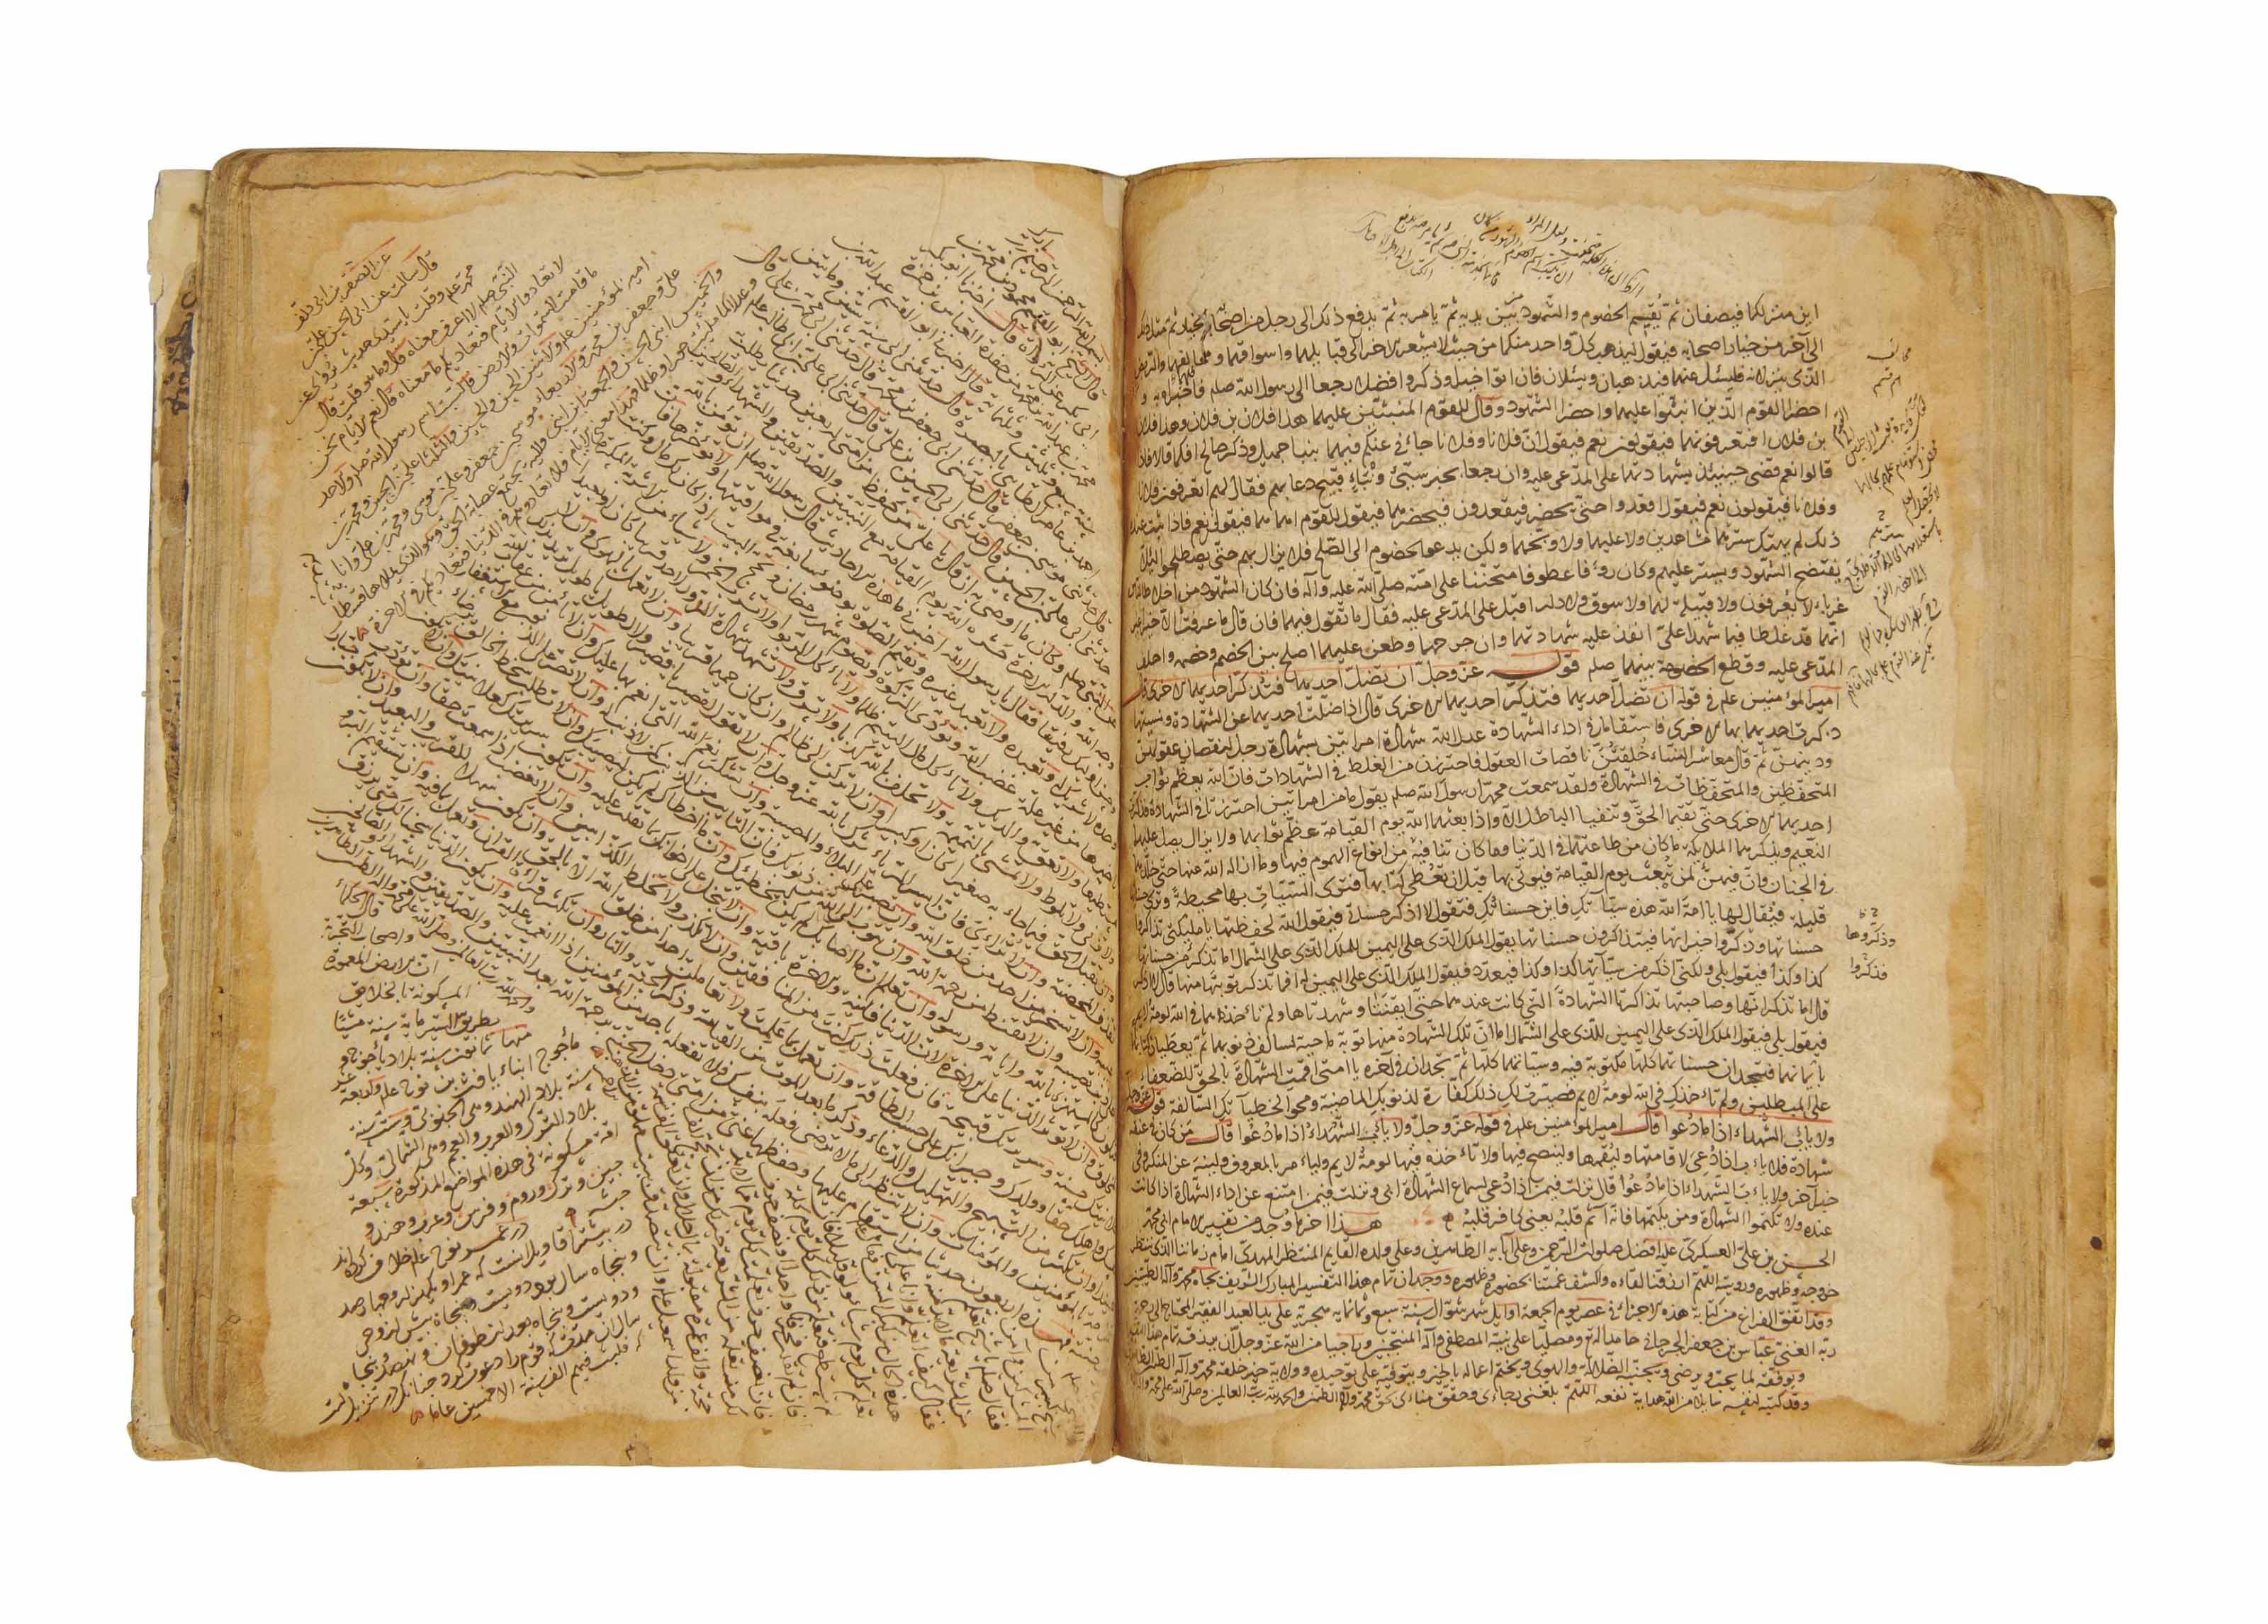 AL-IMAM MUHAMMAD AL-HASSAN BIN